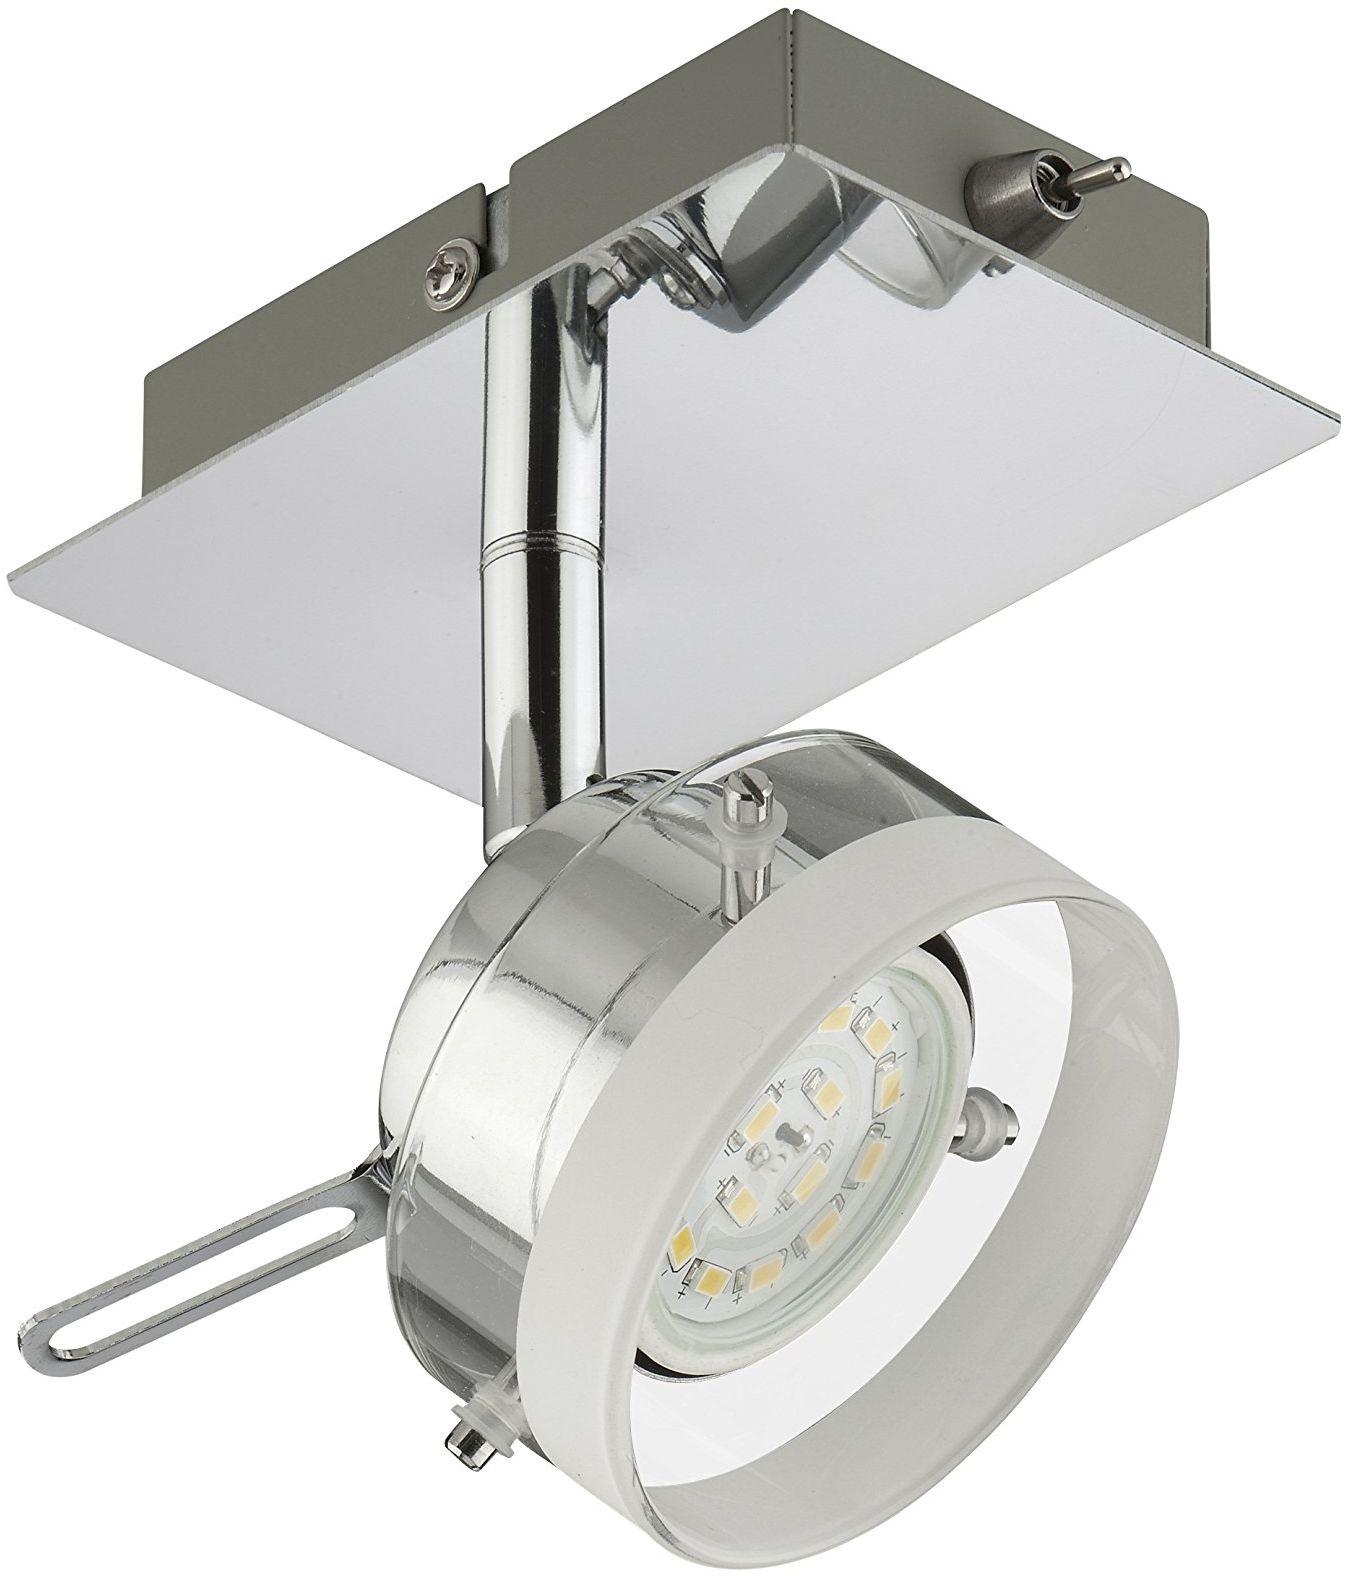 Lampa sufitowa, lampa LED, lampa ścienna, lampa sufitowa, reflektor LED, lampa punktowa, lampa do salonu, reflektor sufitowy, reflektor ścienny, reflektor sufitowy, obrotowy i wychylny